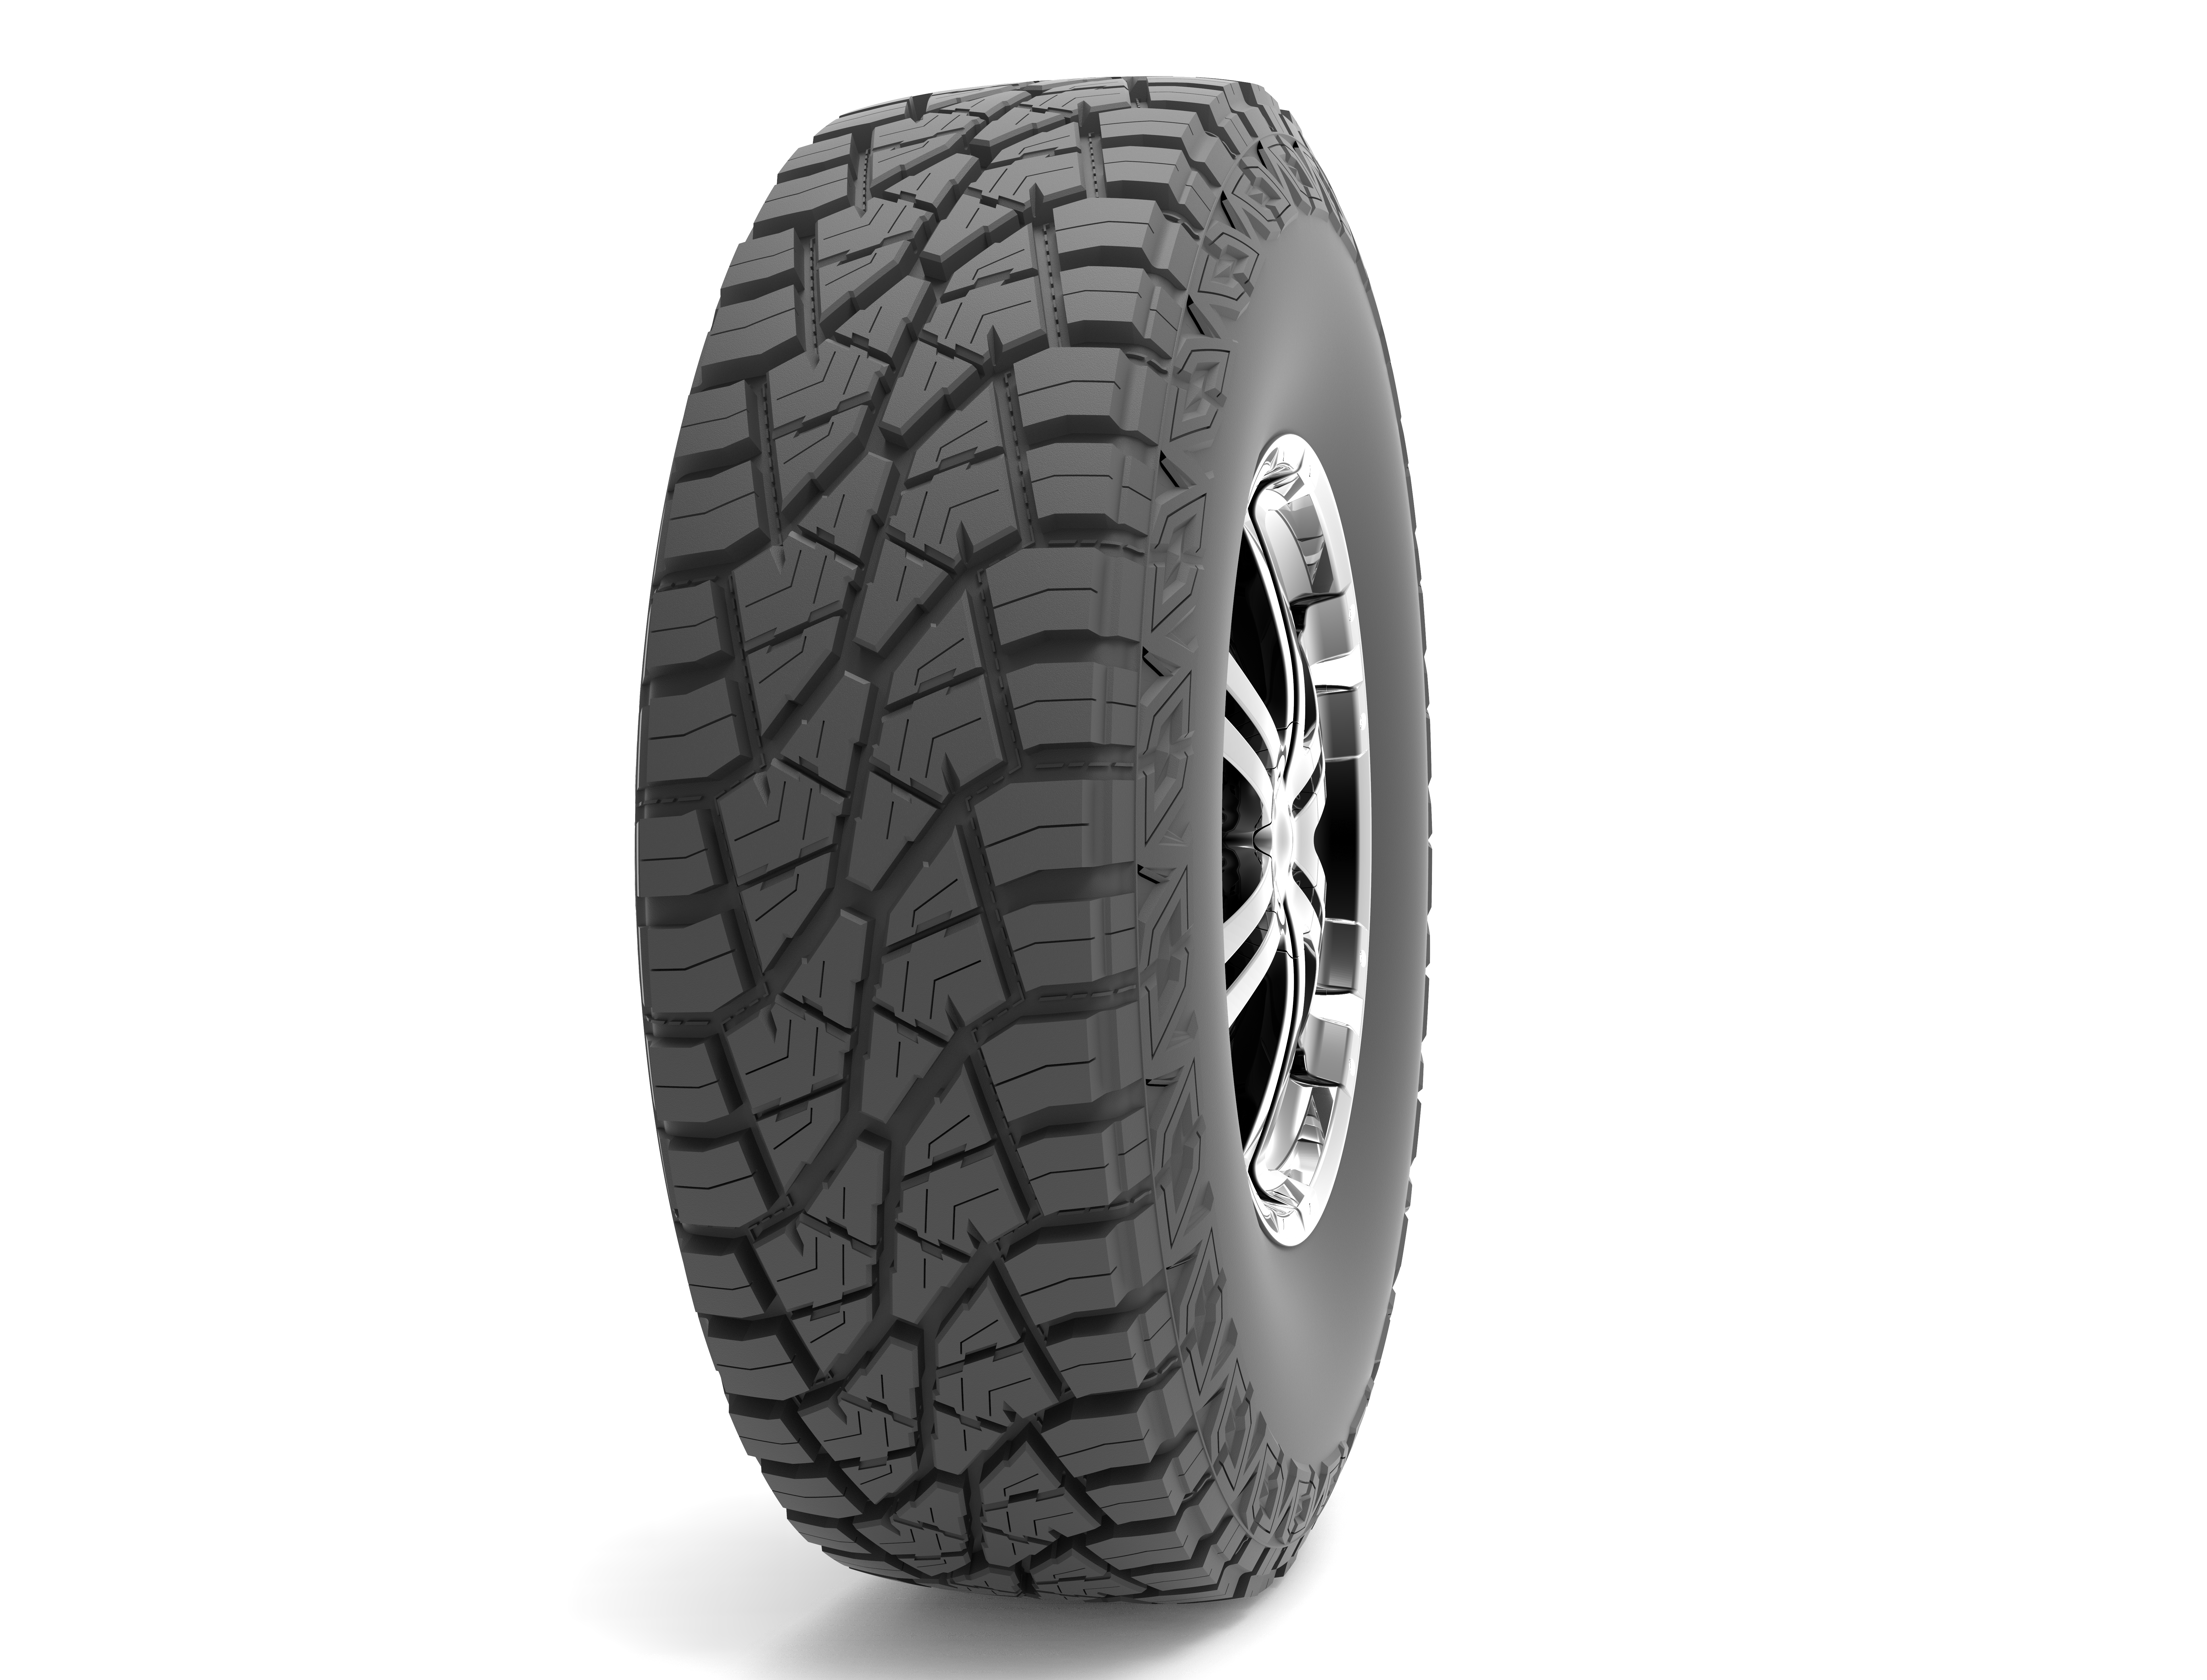 NAMA Expands Maxxploit Light Truck Tire Line